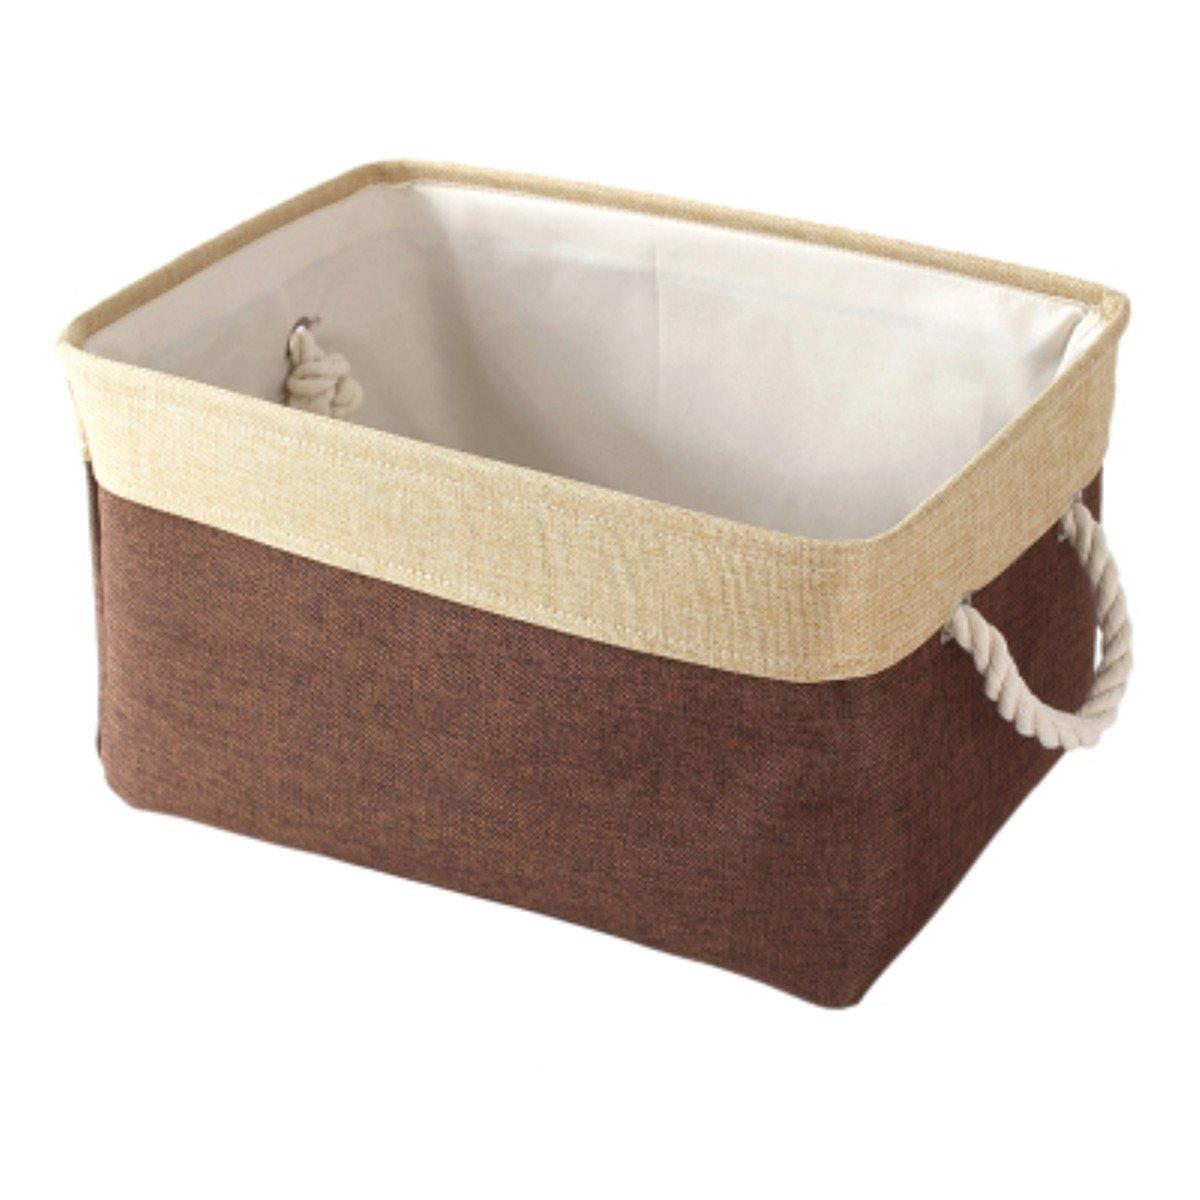 Canvos Collapsible Storage Basket Bin with Handles for Clothes Storage,Toy Organizer,Nursery Baskets,Kids Basket Baby Bin (Coffee)